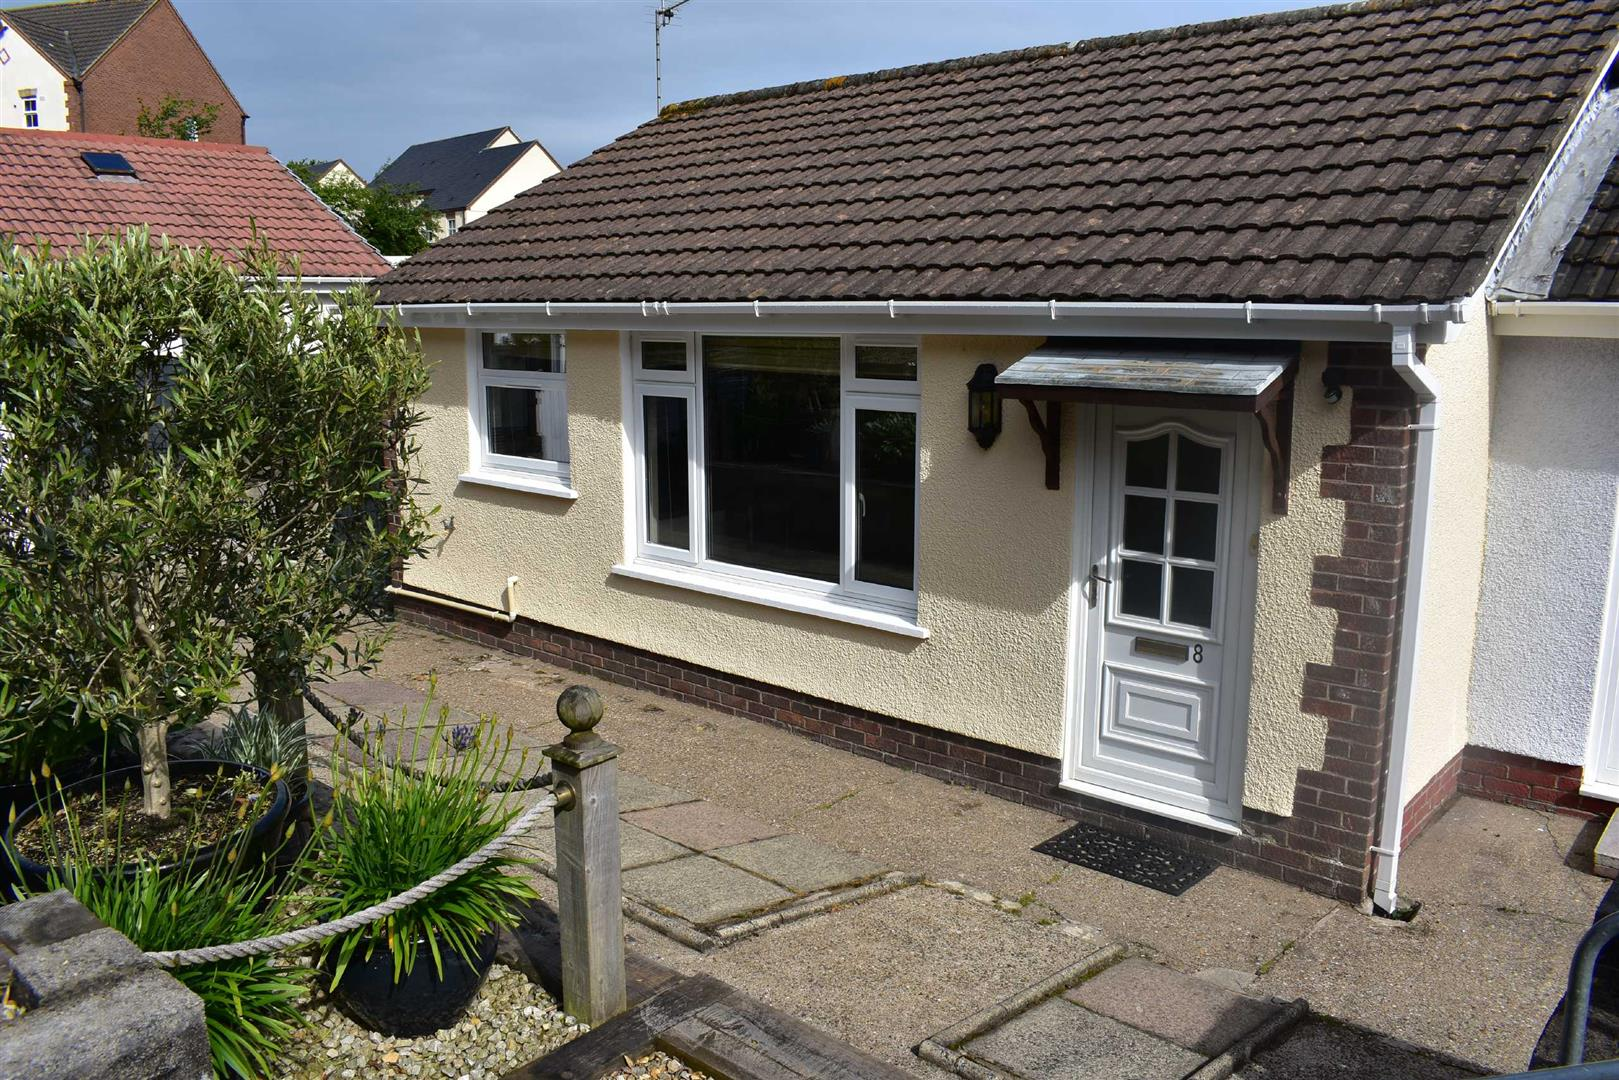 Sarlou Close, Limeslade, Swansea, SA3 4JG